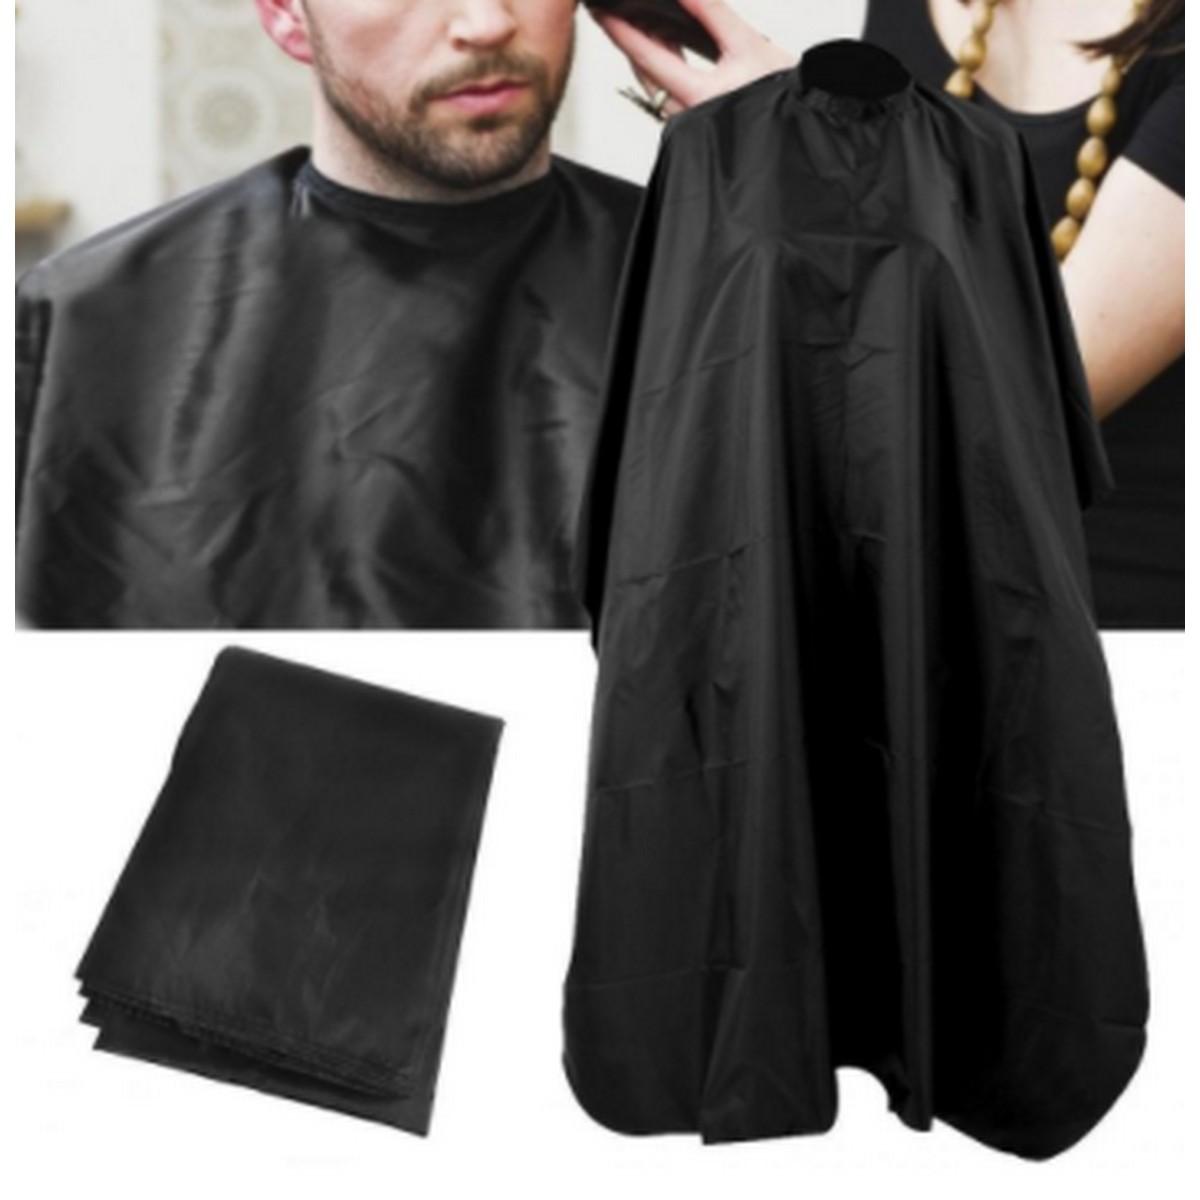 Apron Of Black Colour Hairdressing Cape Professional Hair-Cut Salon Barber Cloth Wrap Protect Gown Apron Waterproof Cutting Gown Hair Cloth Wrap